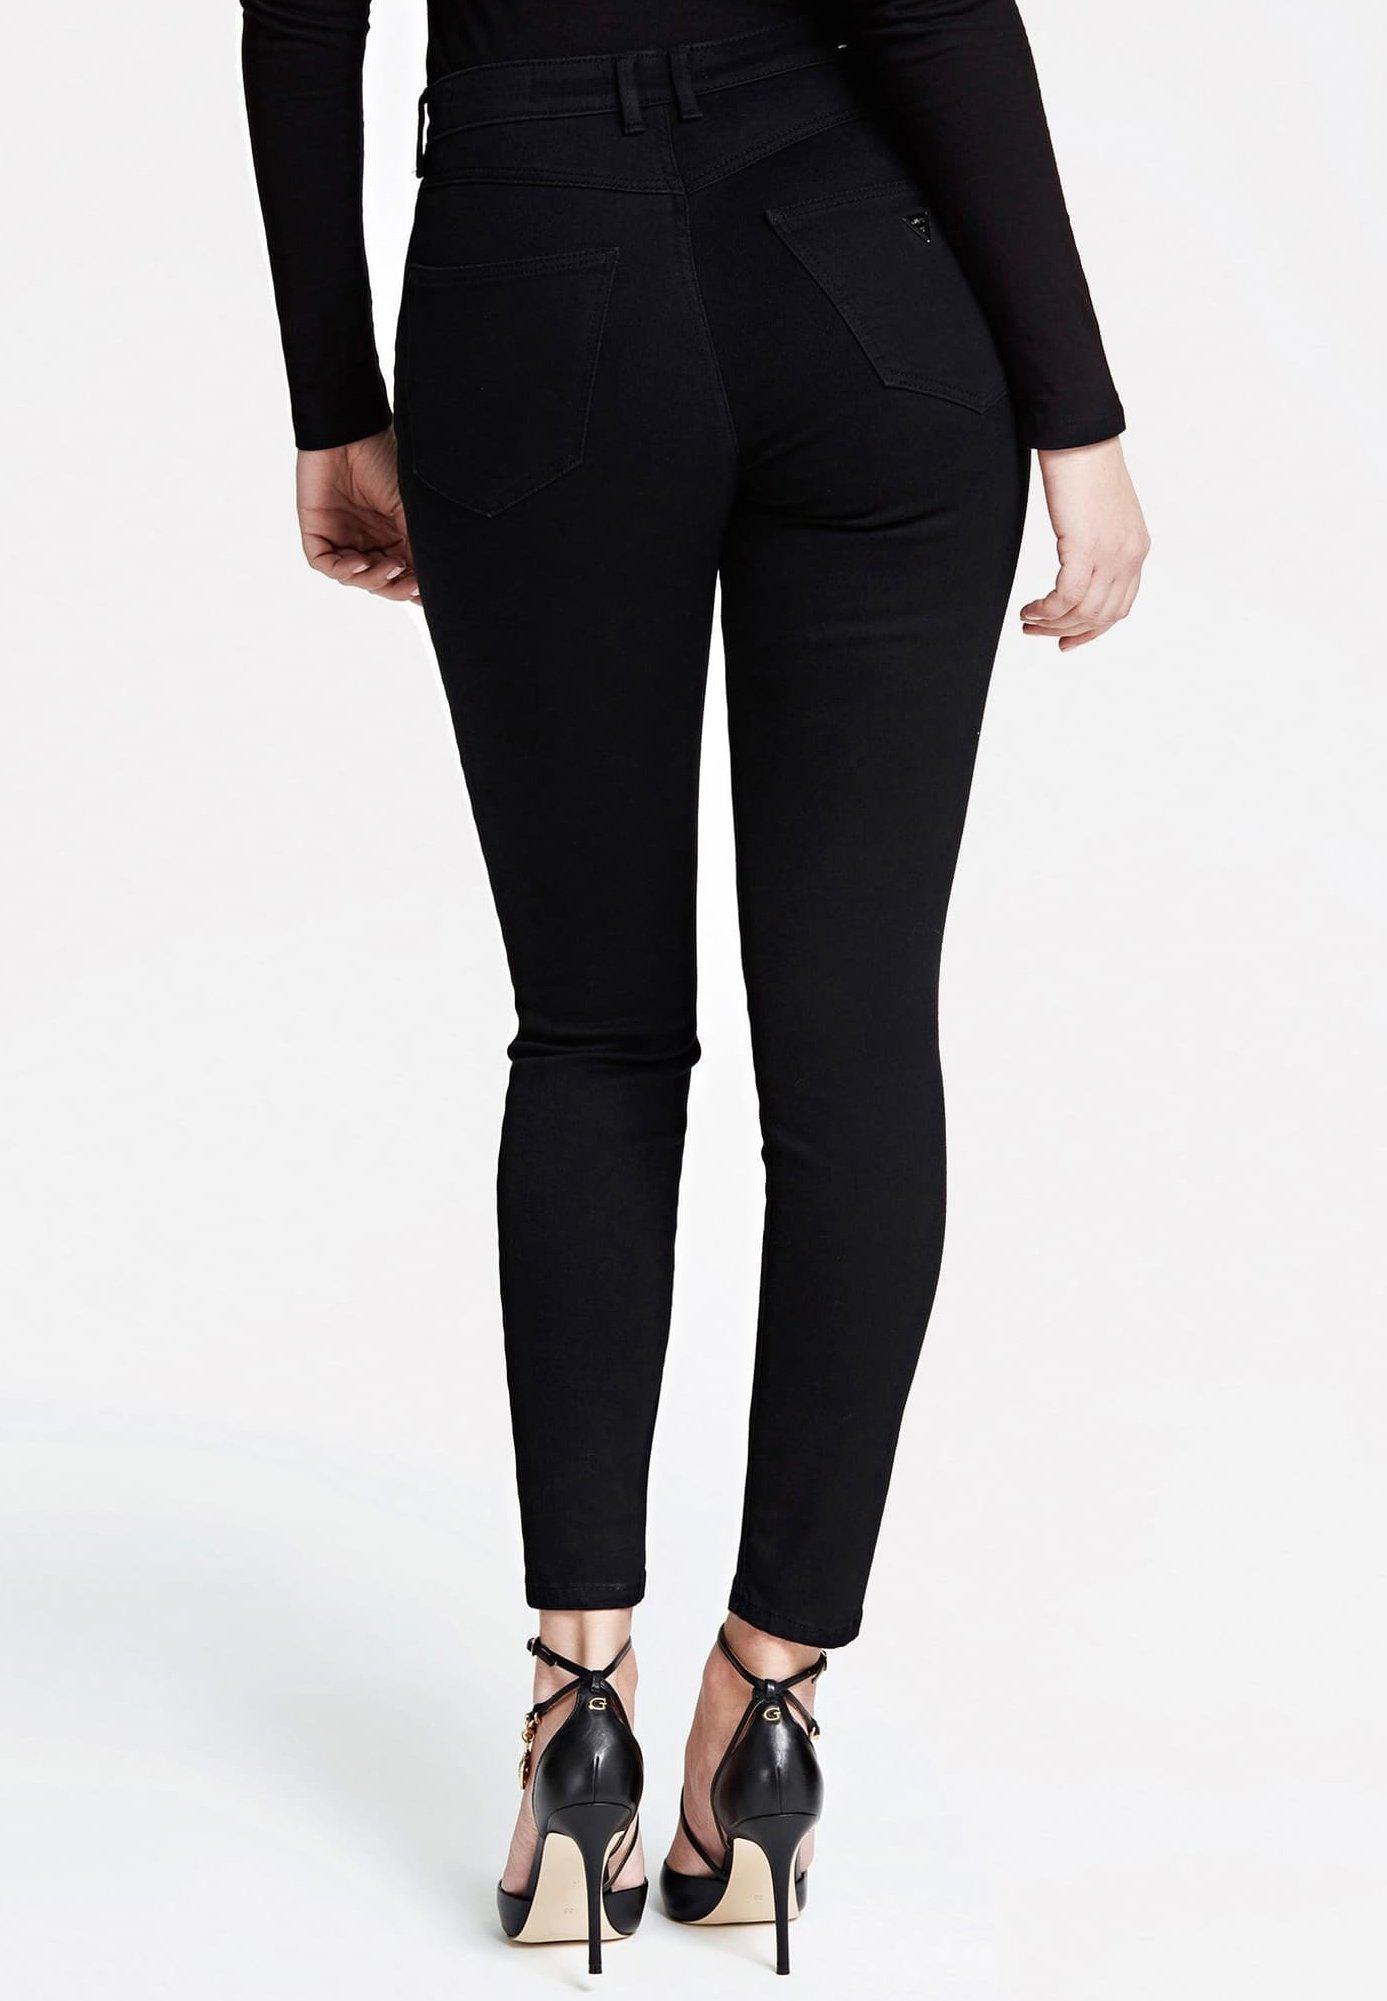 Guess Hoher Bund - Pantalon Classique Schwarz